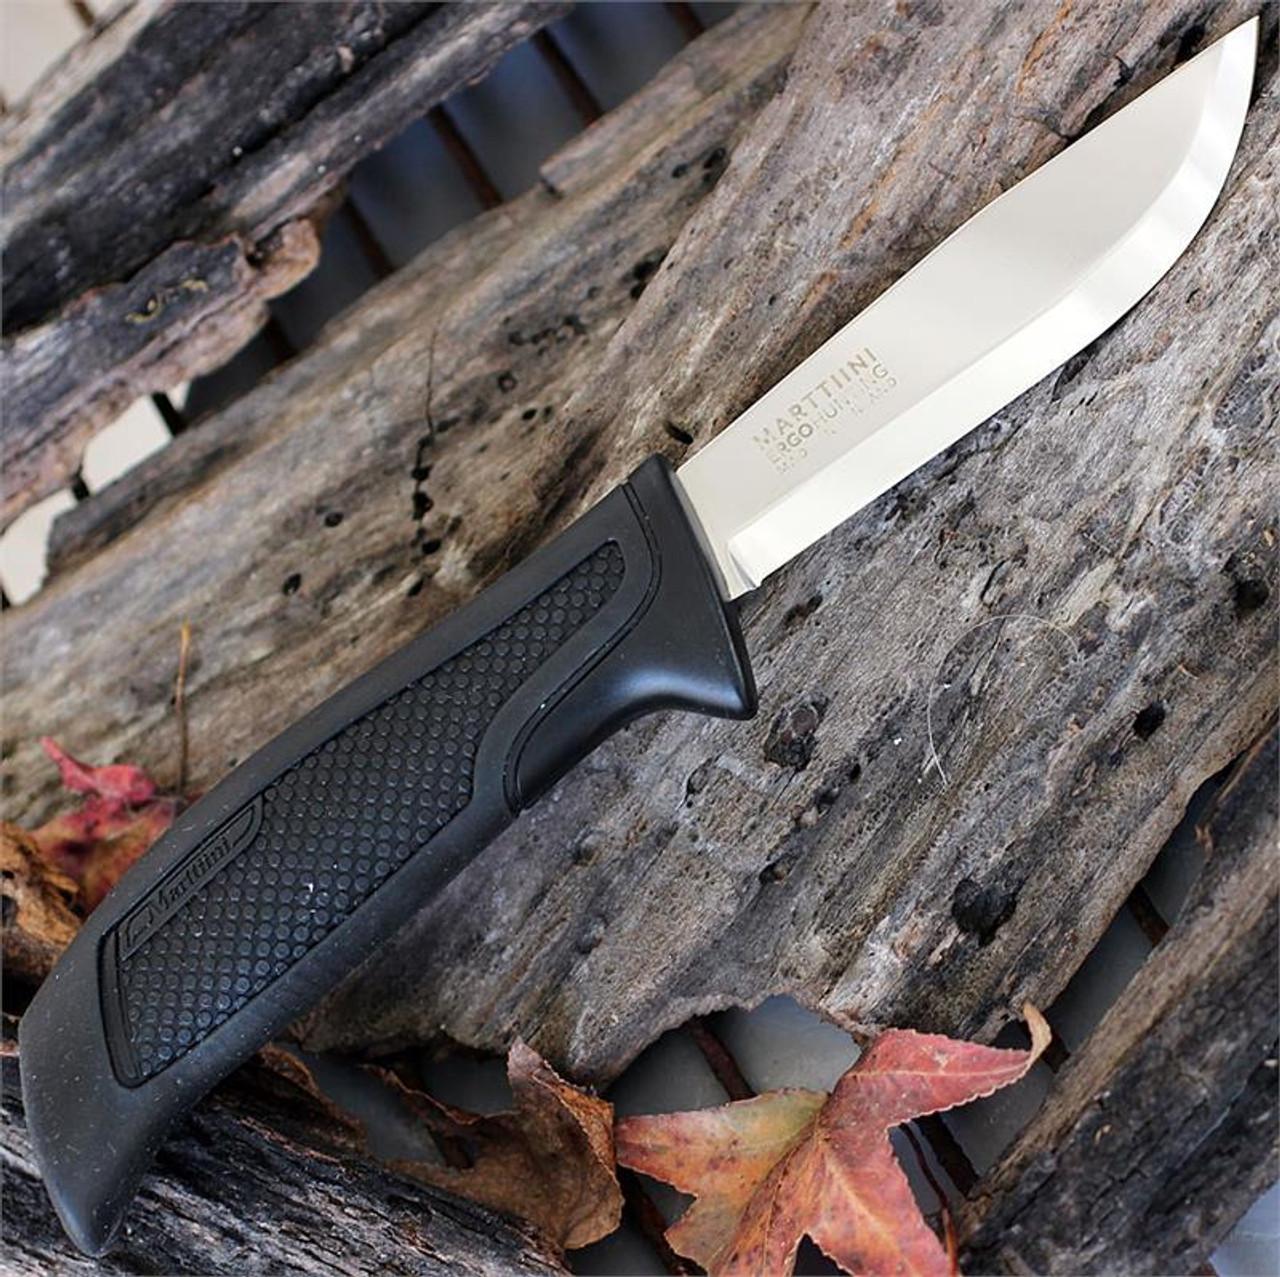 Marttiini Skinner Ergo 320010 9 in. Fixed Blade